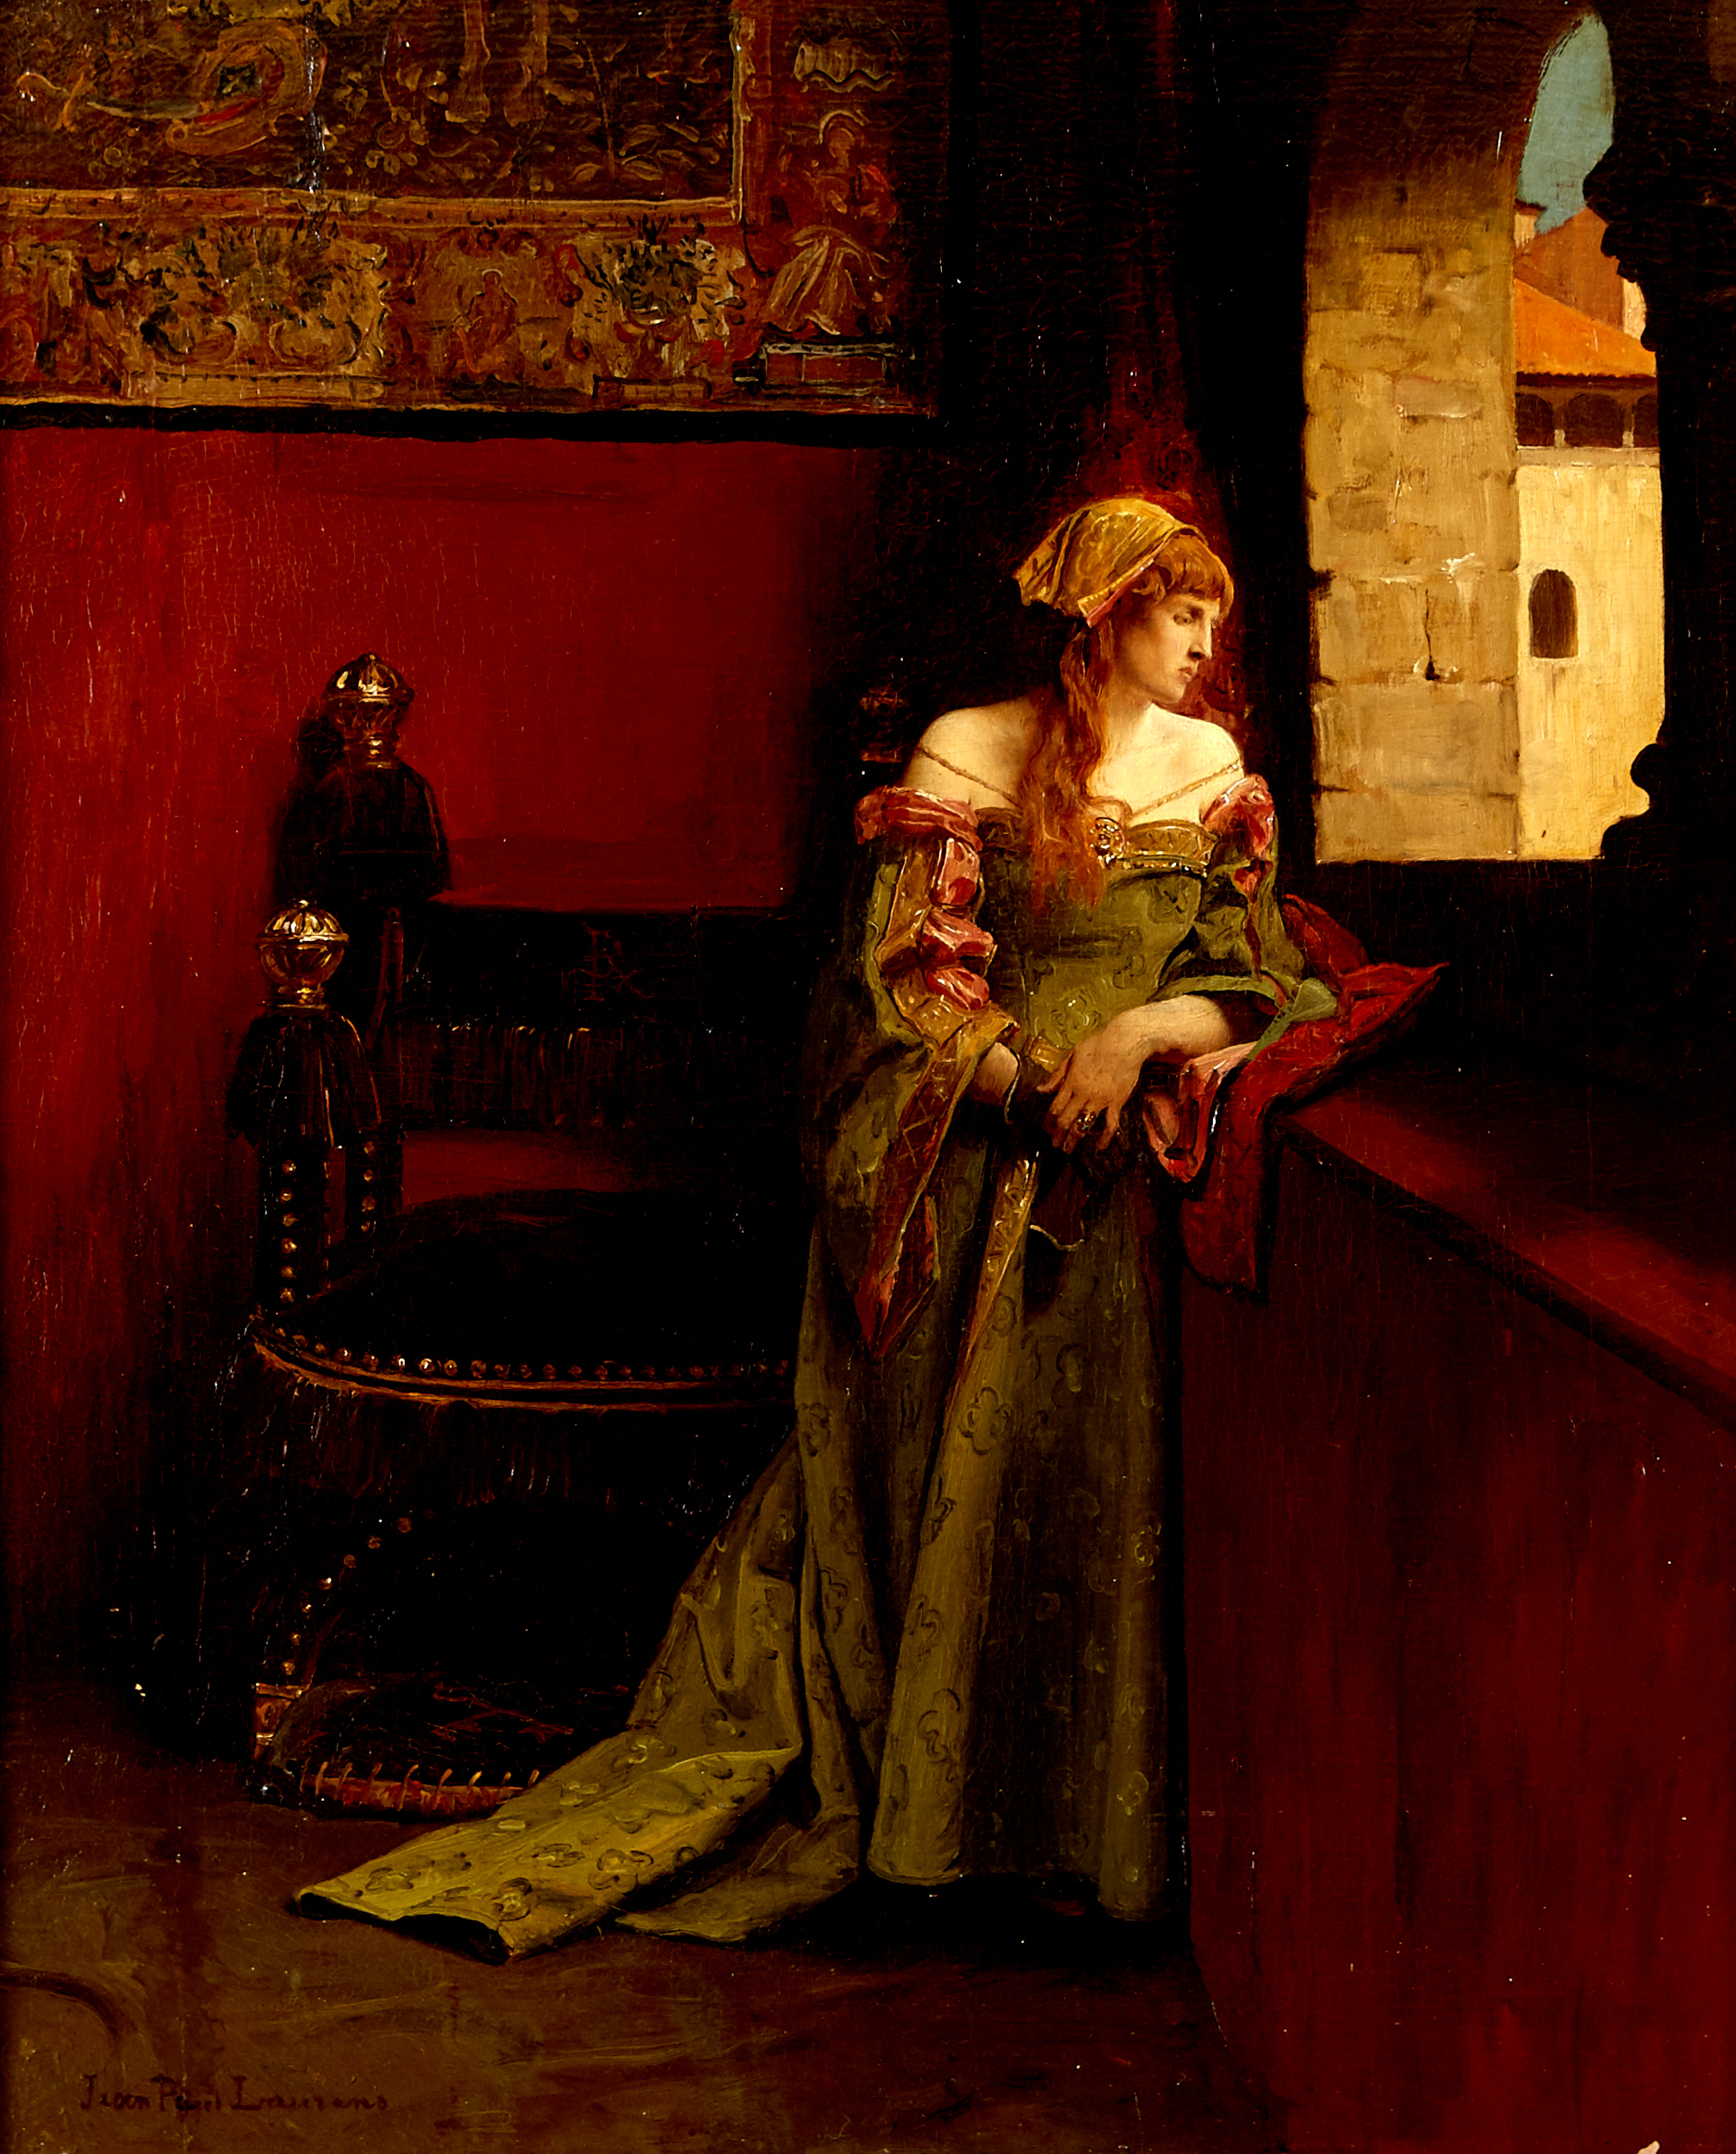 Lot 14 - Jean Paul Laurens Lucretia Borgia Oil Painting